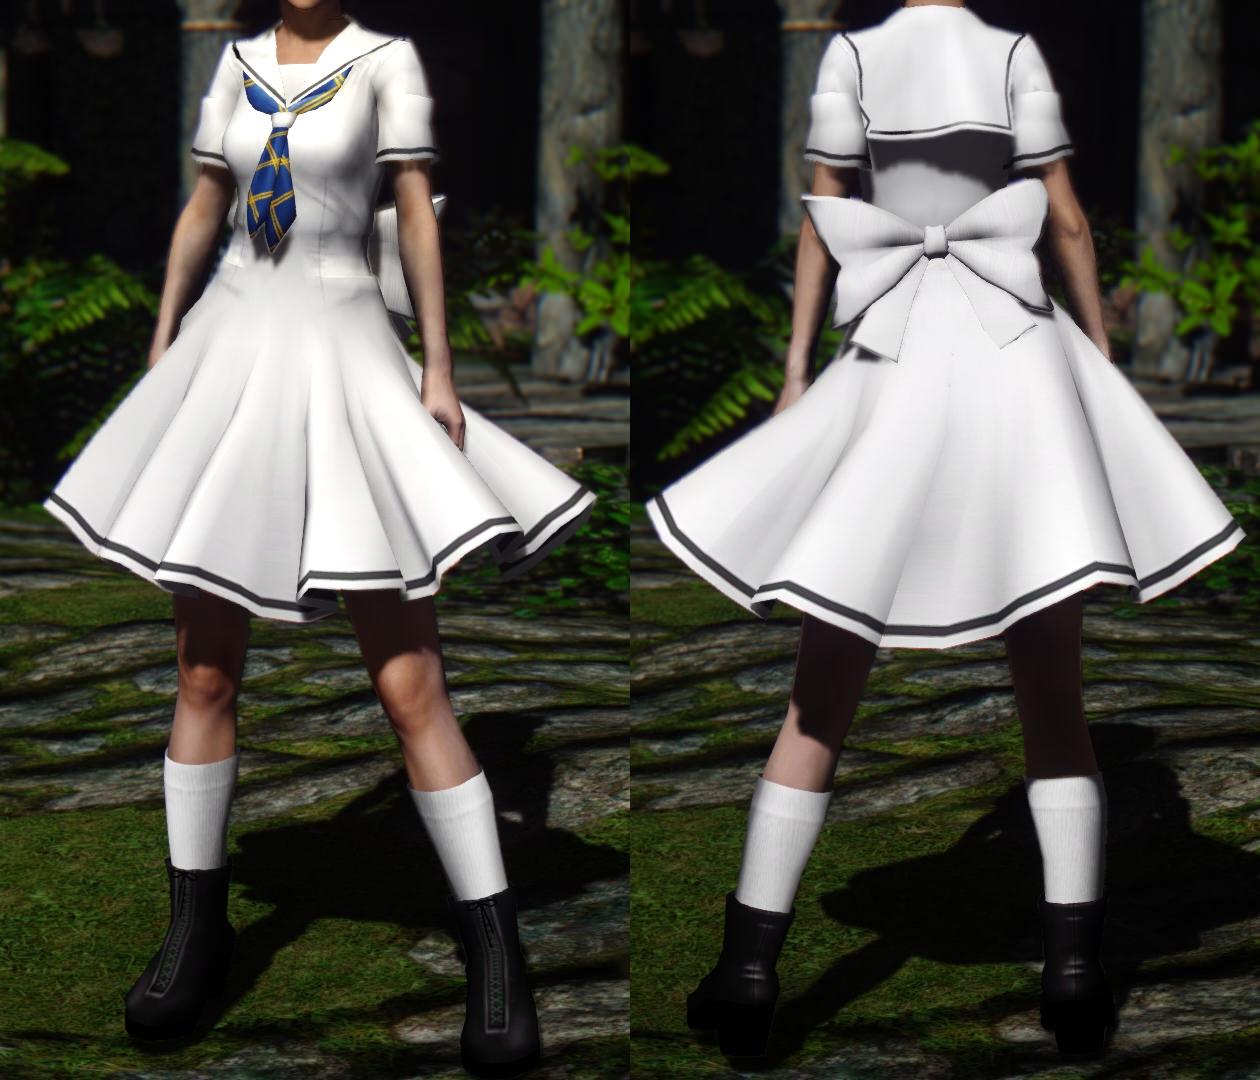 Hentai_SchoolGirl_Uniform_CBBE_3.jpg